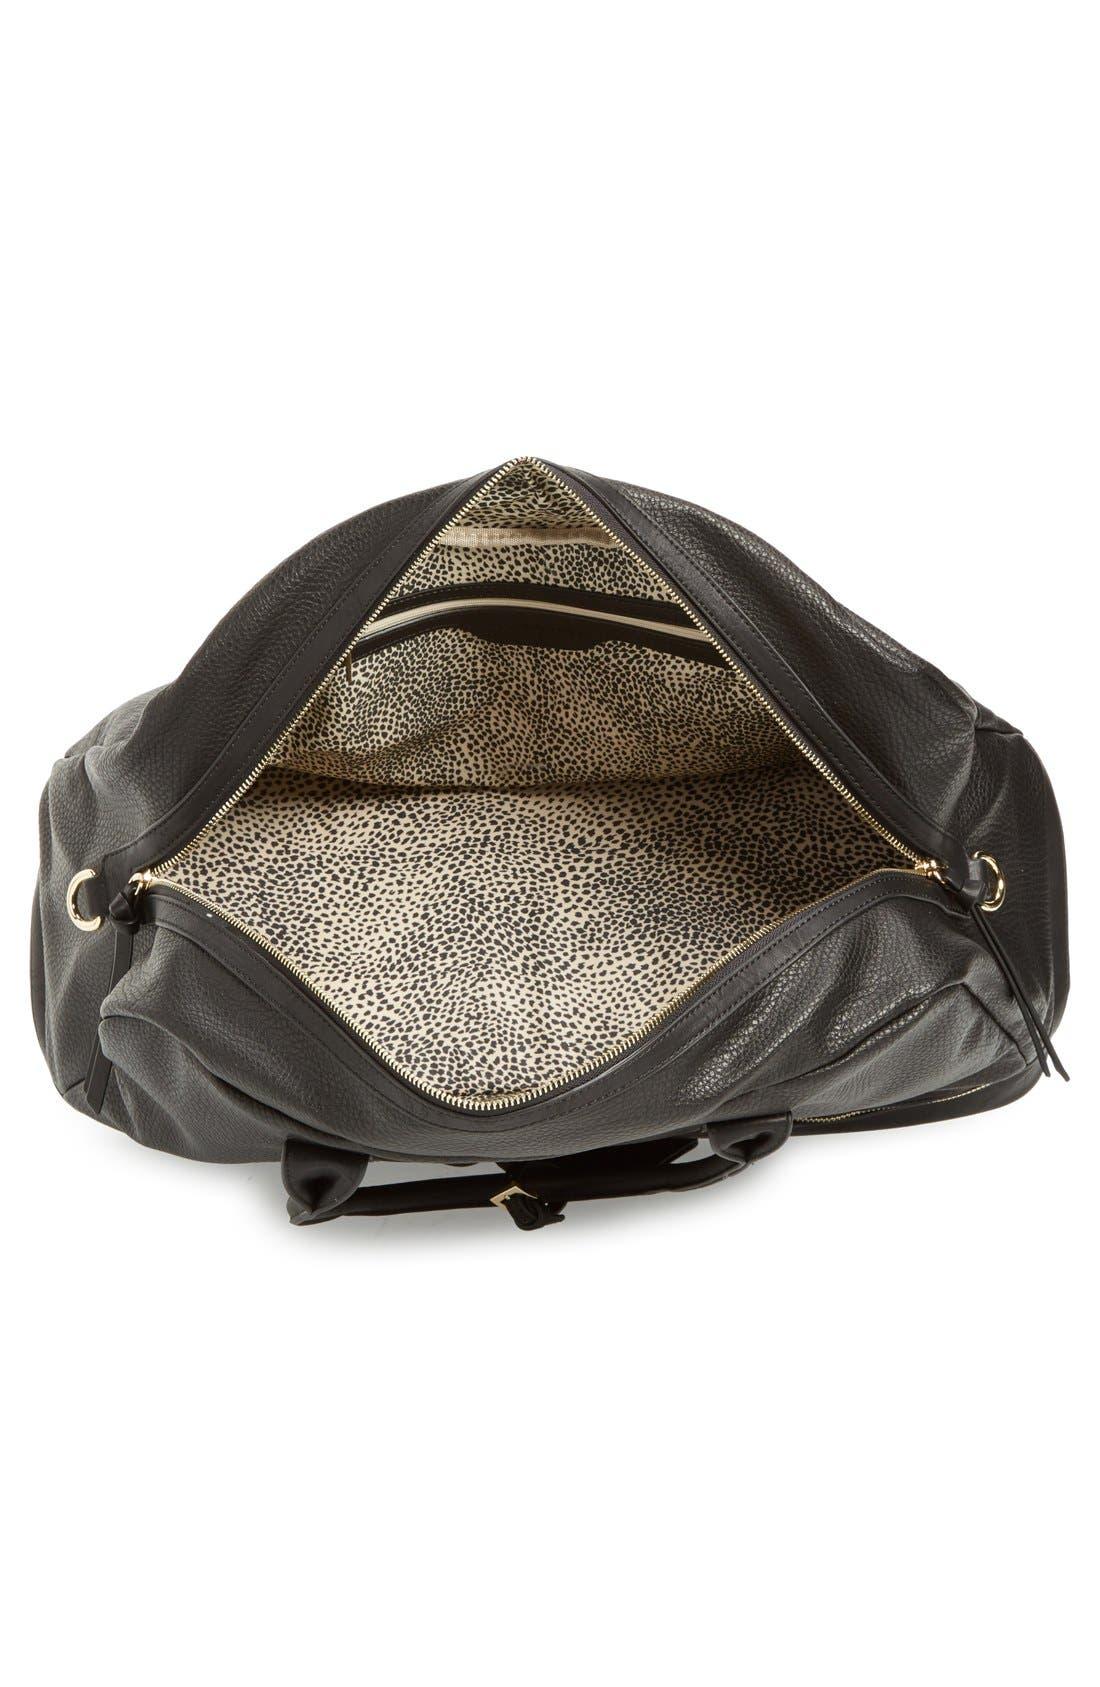 Mason Weekend Bag,                             Alternate thumbnail 4, color,                             Pebbled Black